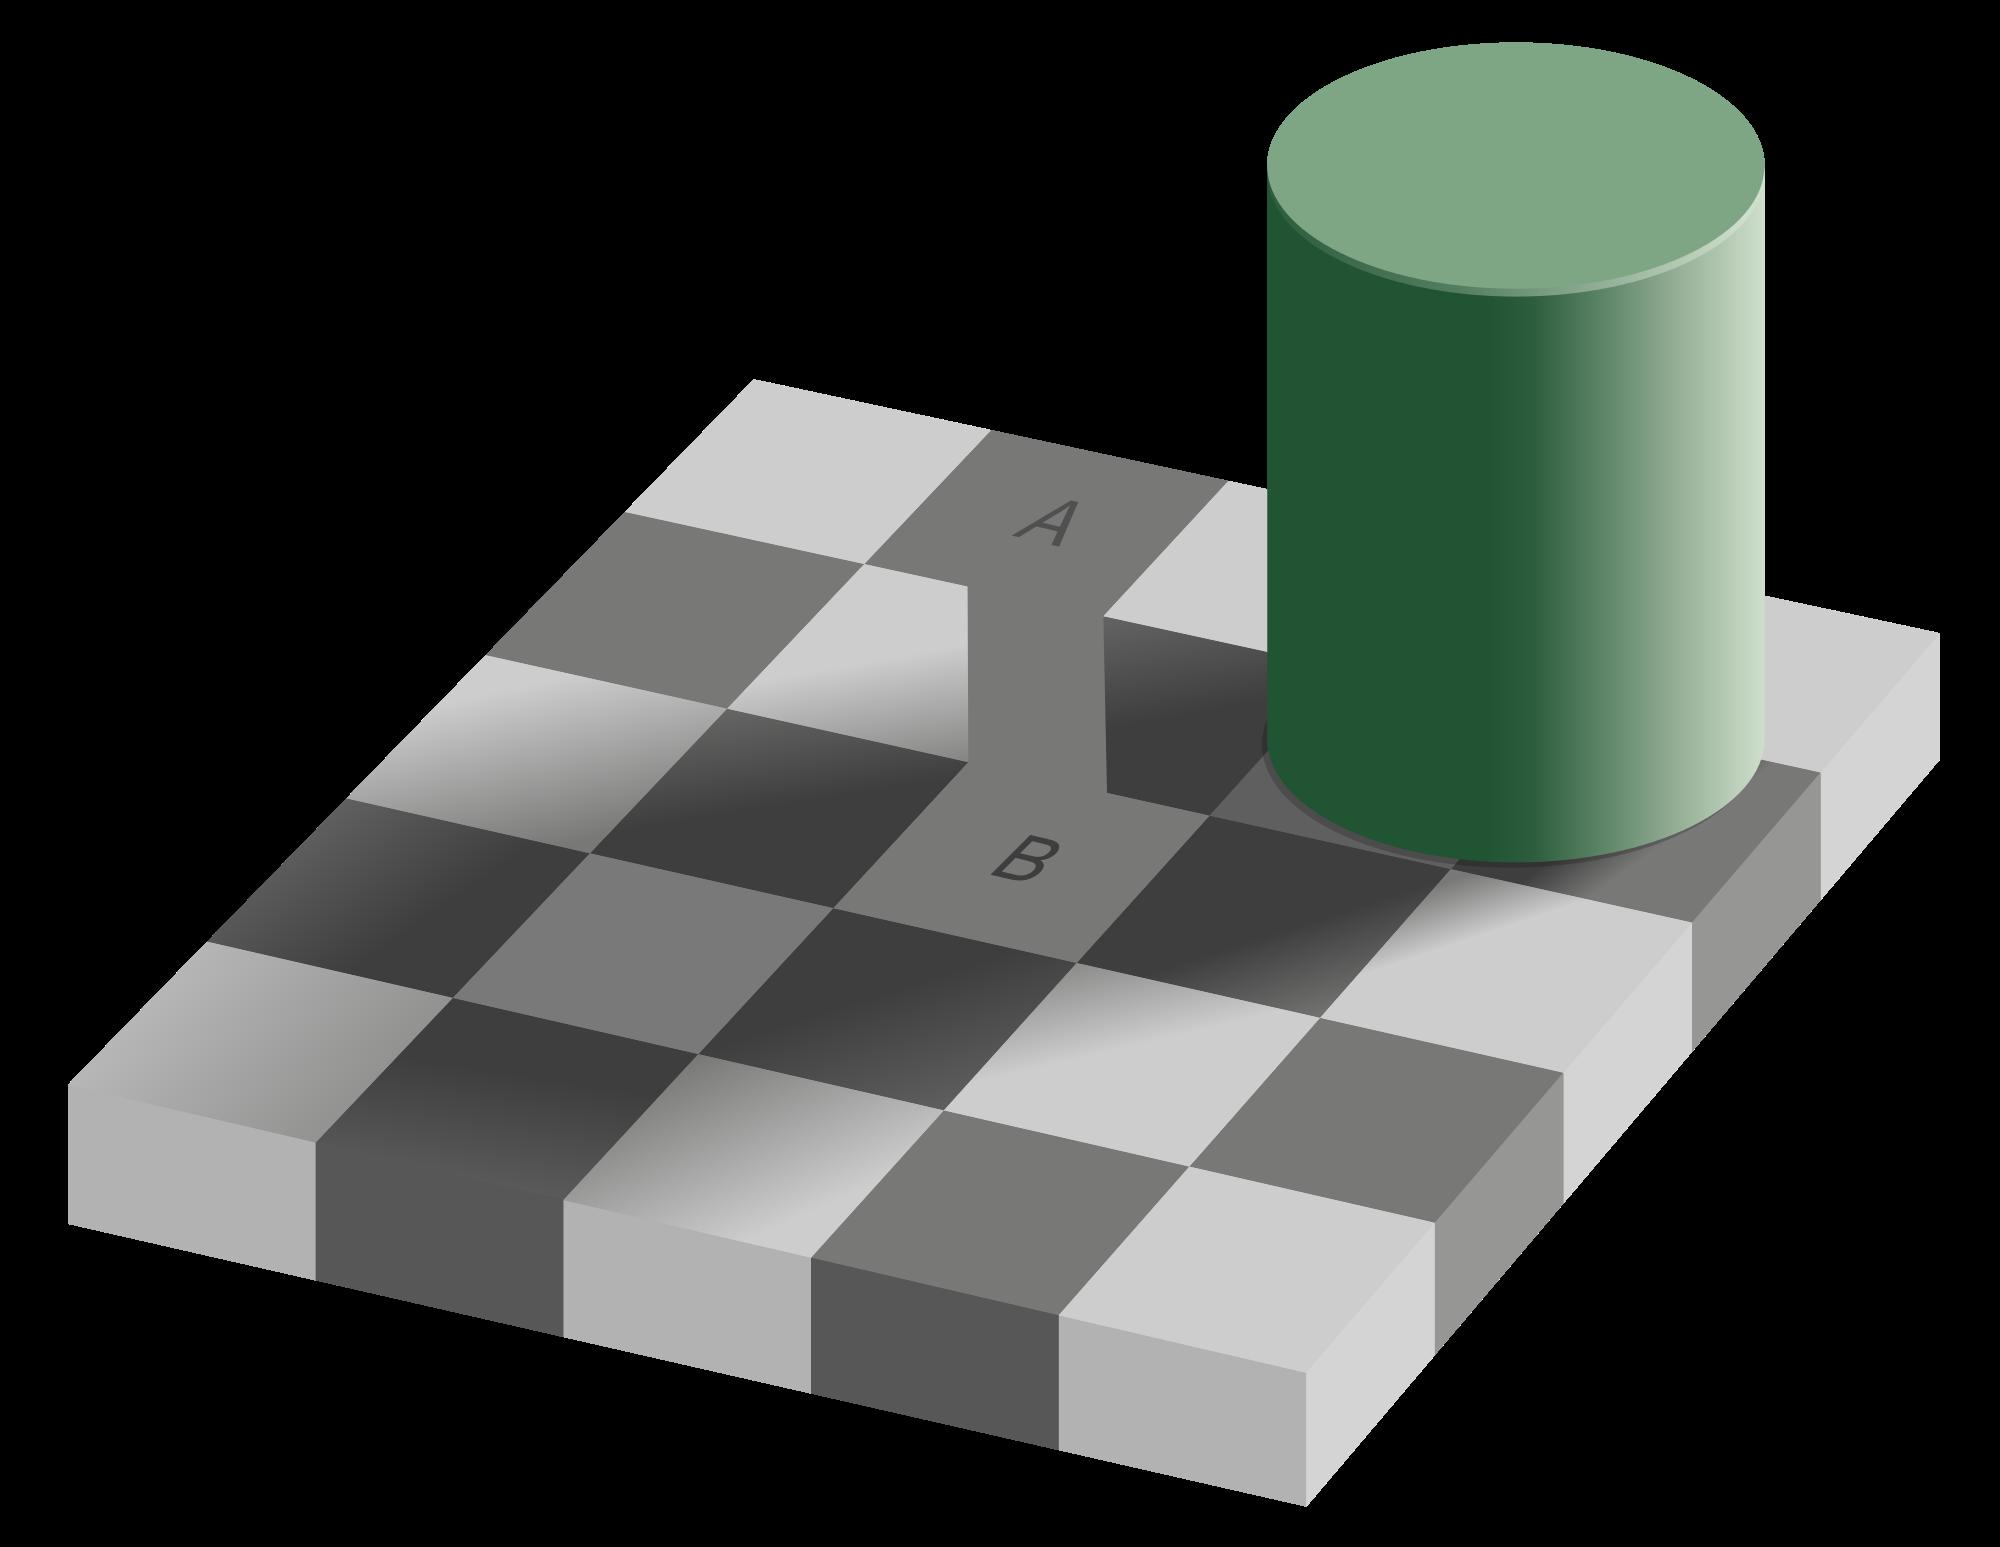 Drawn optical illusion allusion A breaks shows are bar